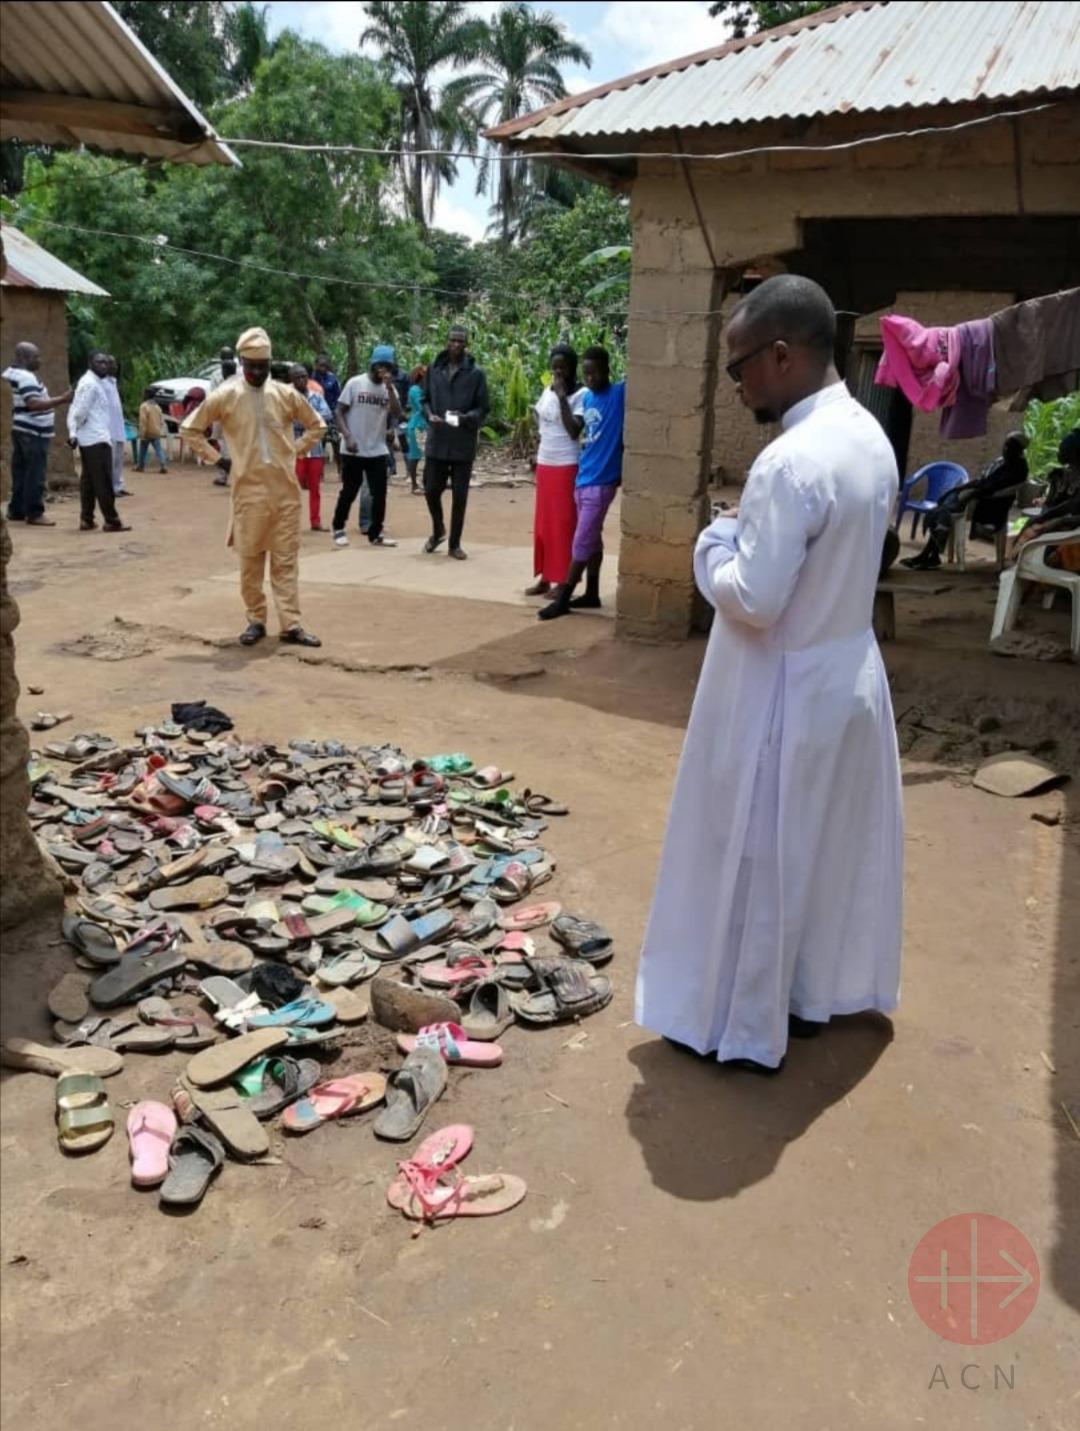 Nigeria padre Sam contempla un montón de sandalias